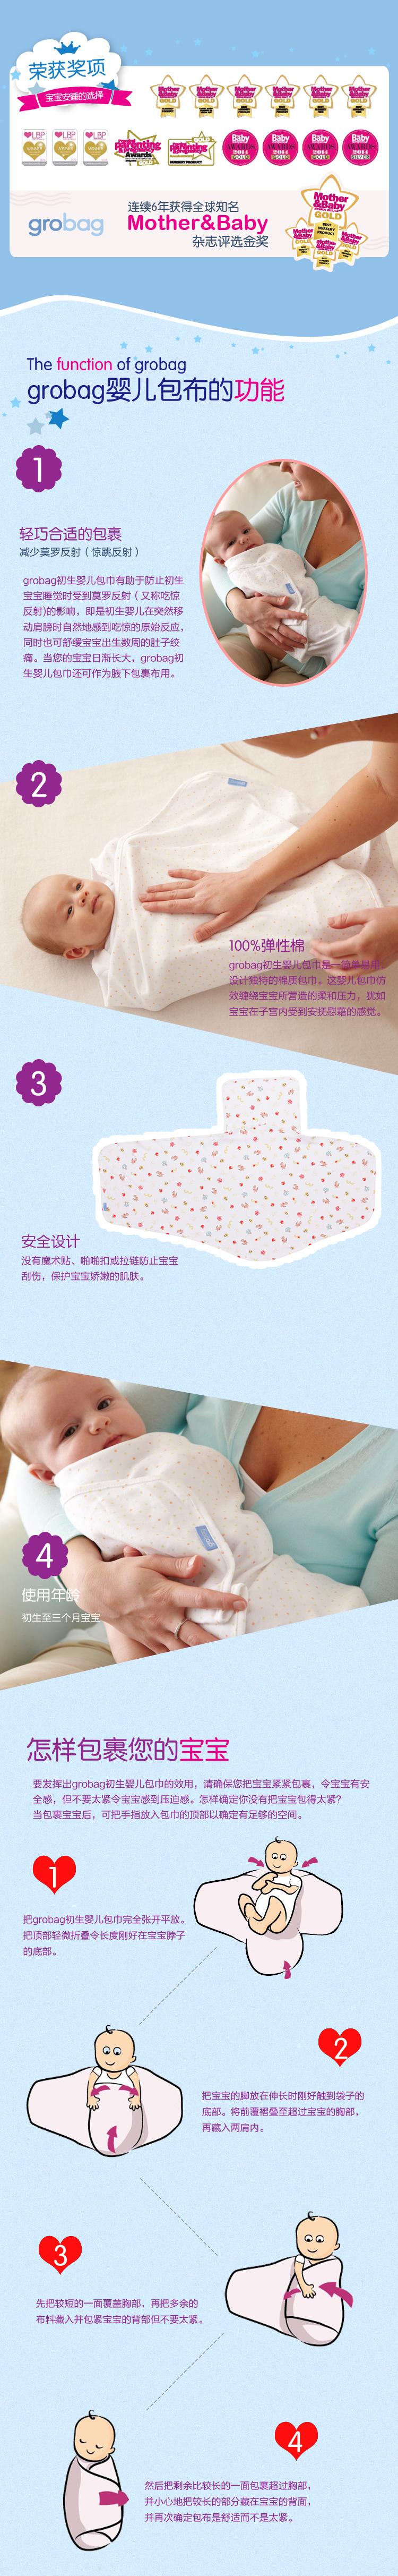 grobag newborn swaddler 新生儿初生宝宝睡袋防惊包巾